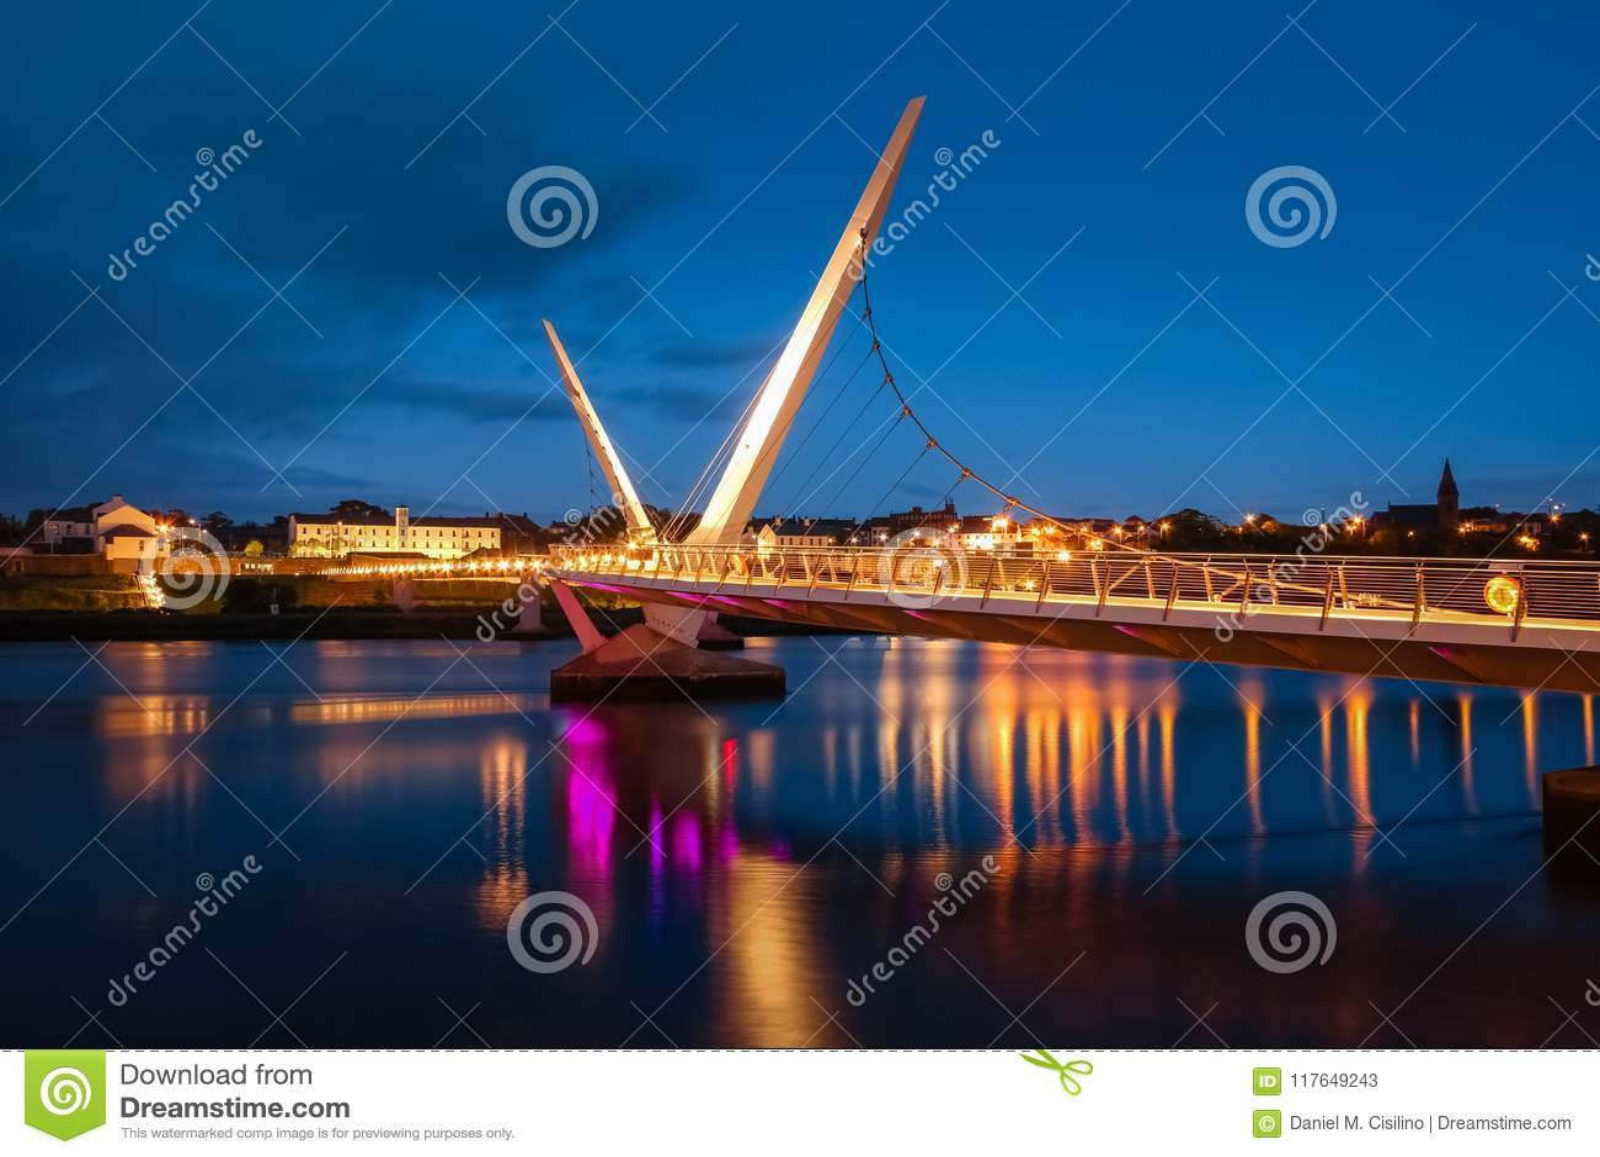 The Peace Bridge. Derry Londonderry. Northern Ireland. United Kingdom